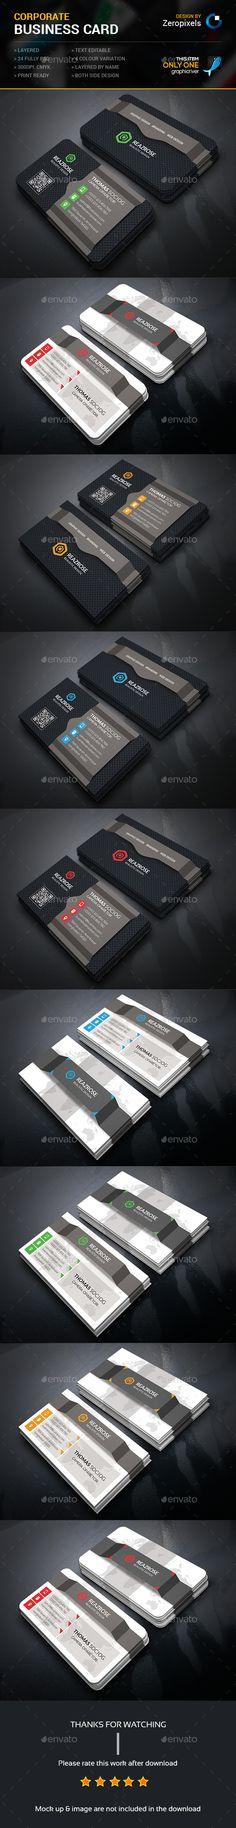 Corporate Business Card Bundle Templates PSD. Download here: http://graphicriver.net/item/corporate-business-card-bundle/16163852?ref=ksioks